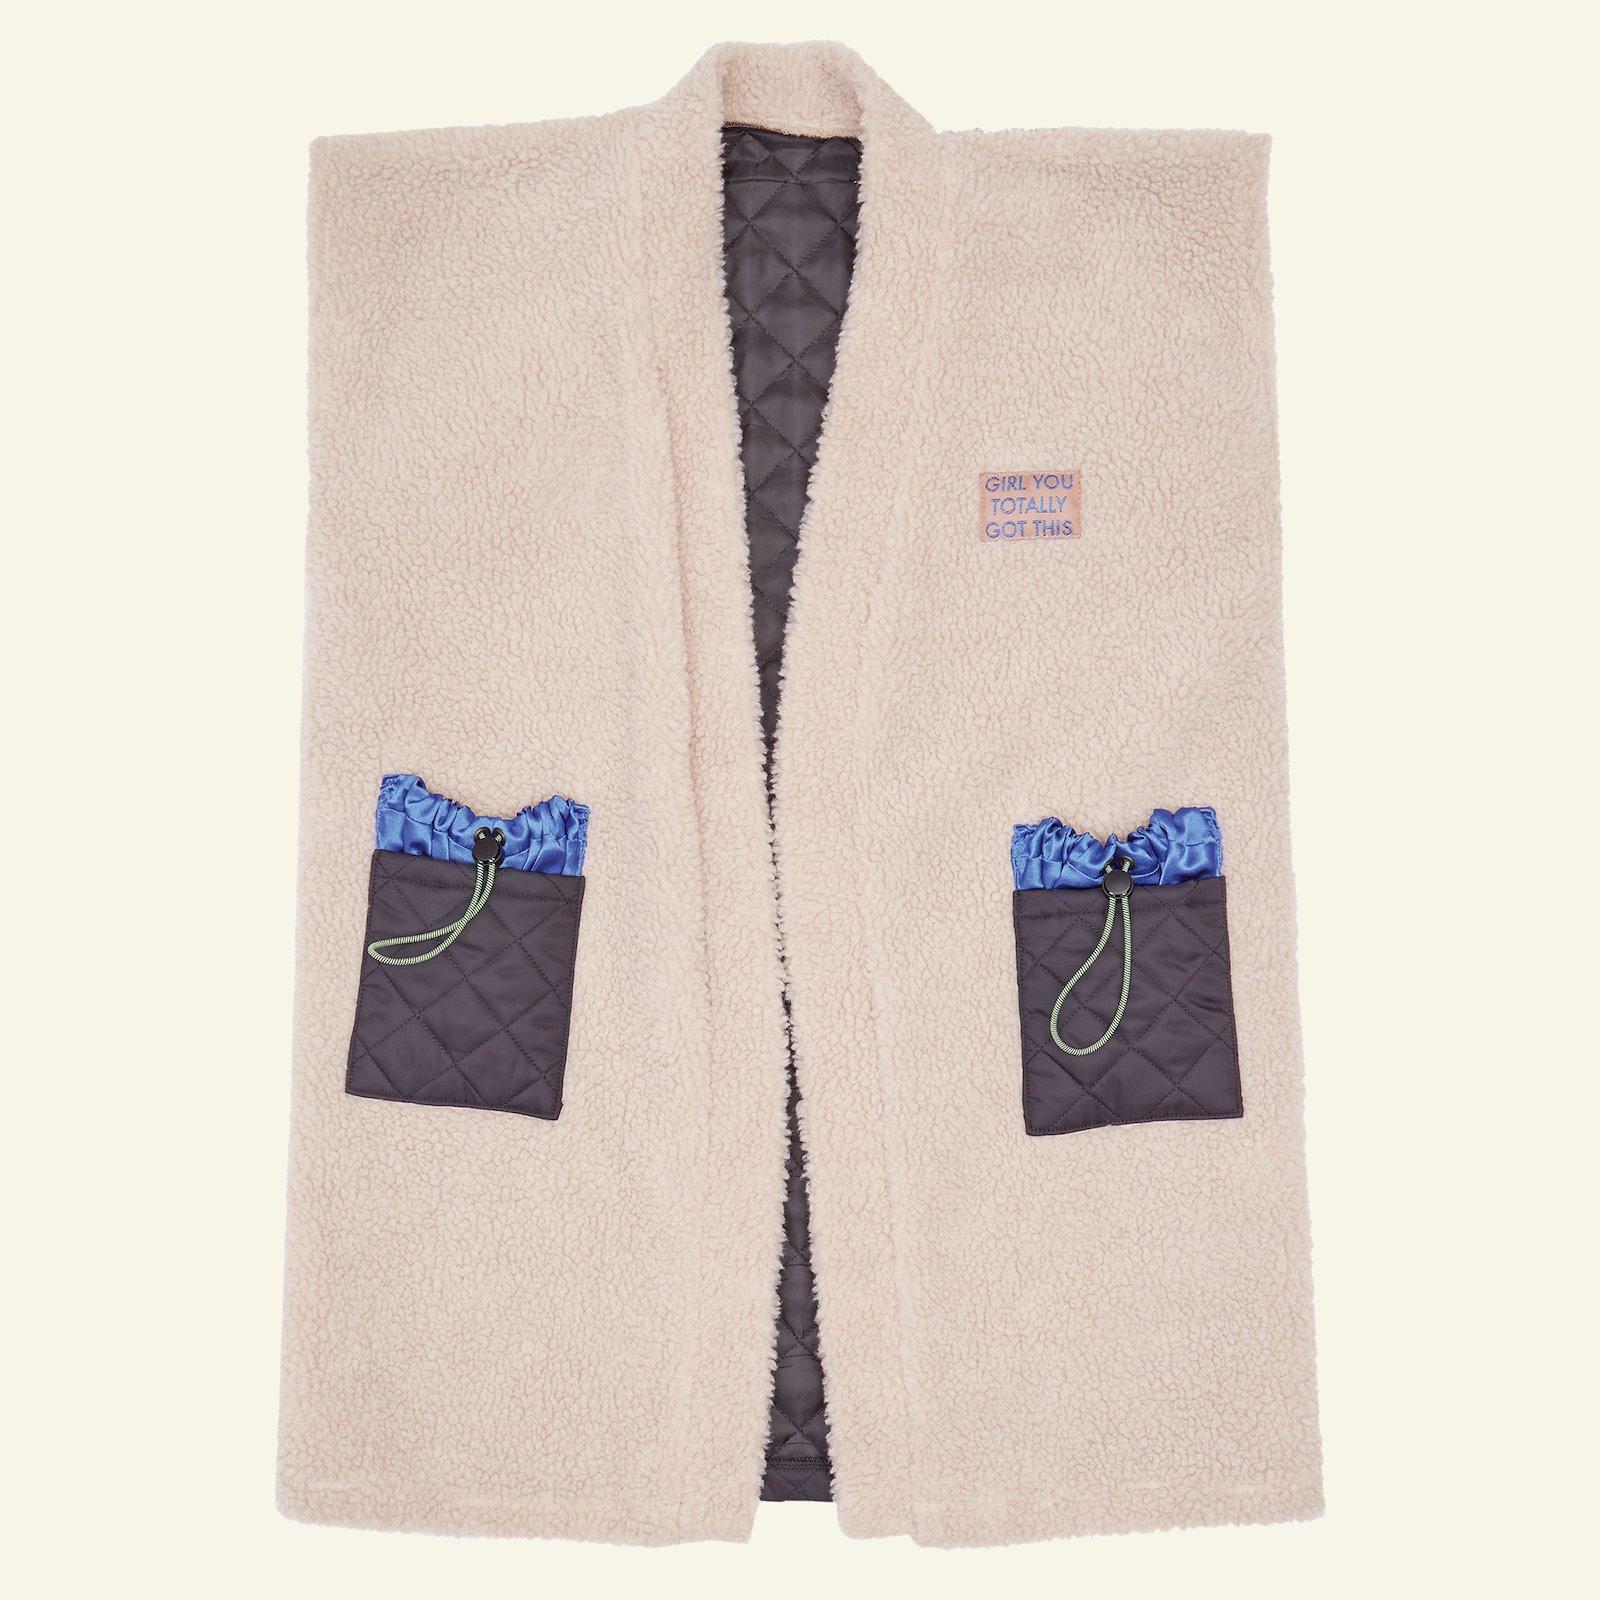 Kimono and tunika, 104/4y p63057_910273_920179_620334_3509072_sskit